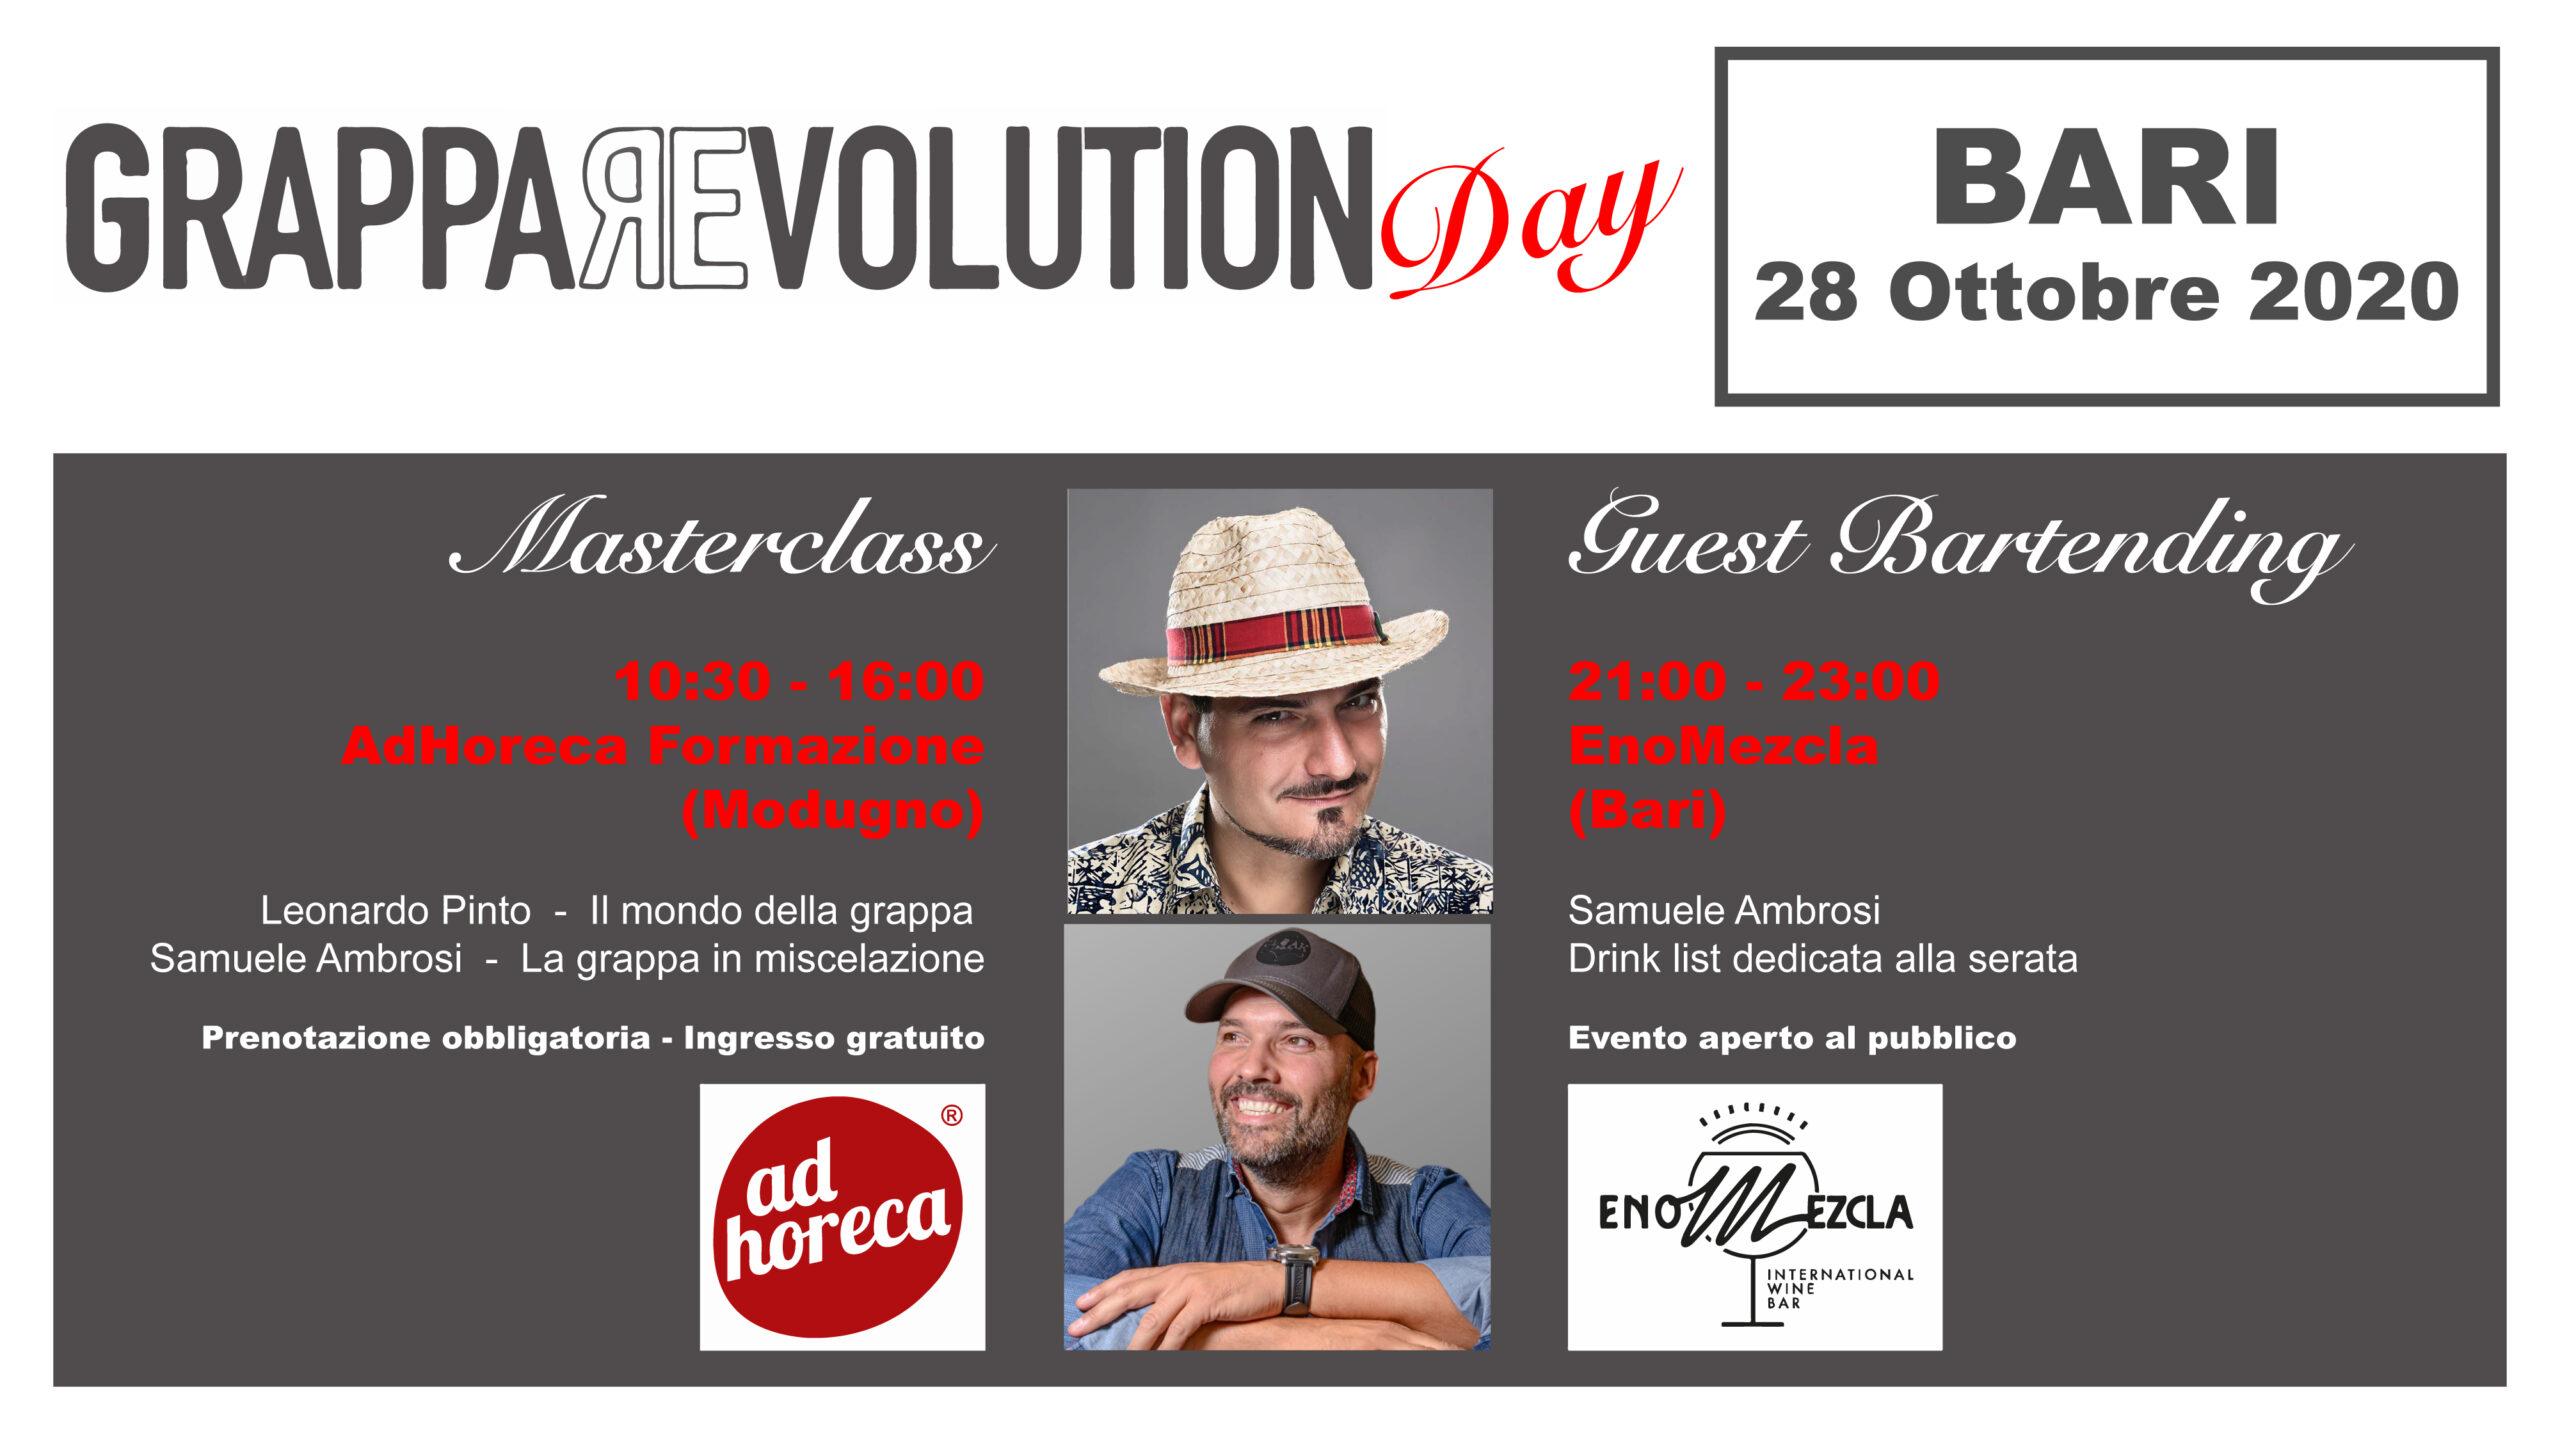 28 ott 20 – GrappaRevolution Day, Bari